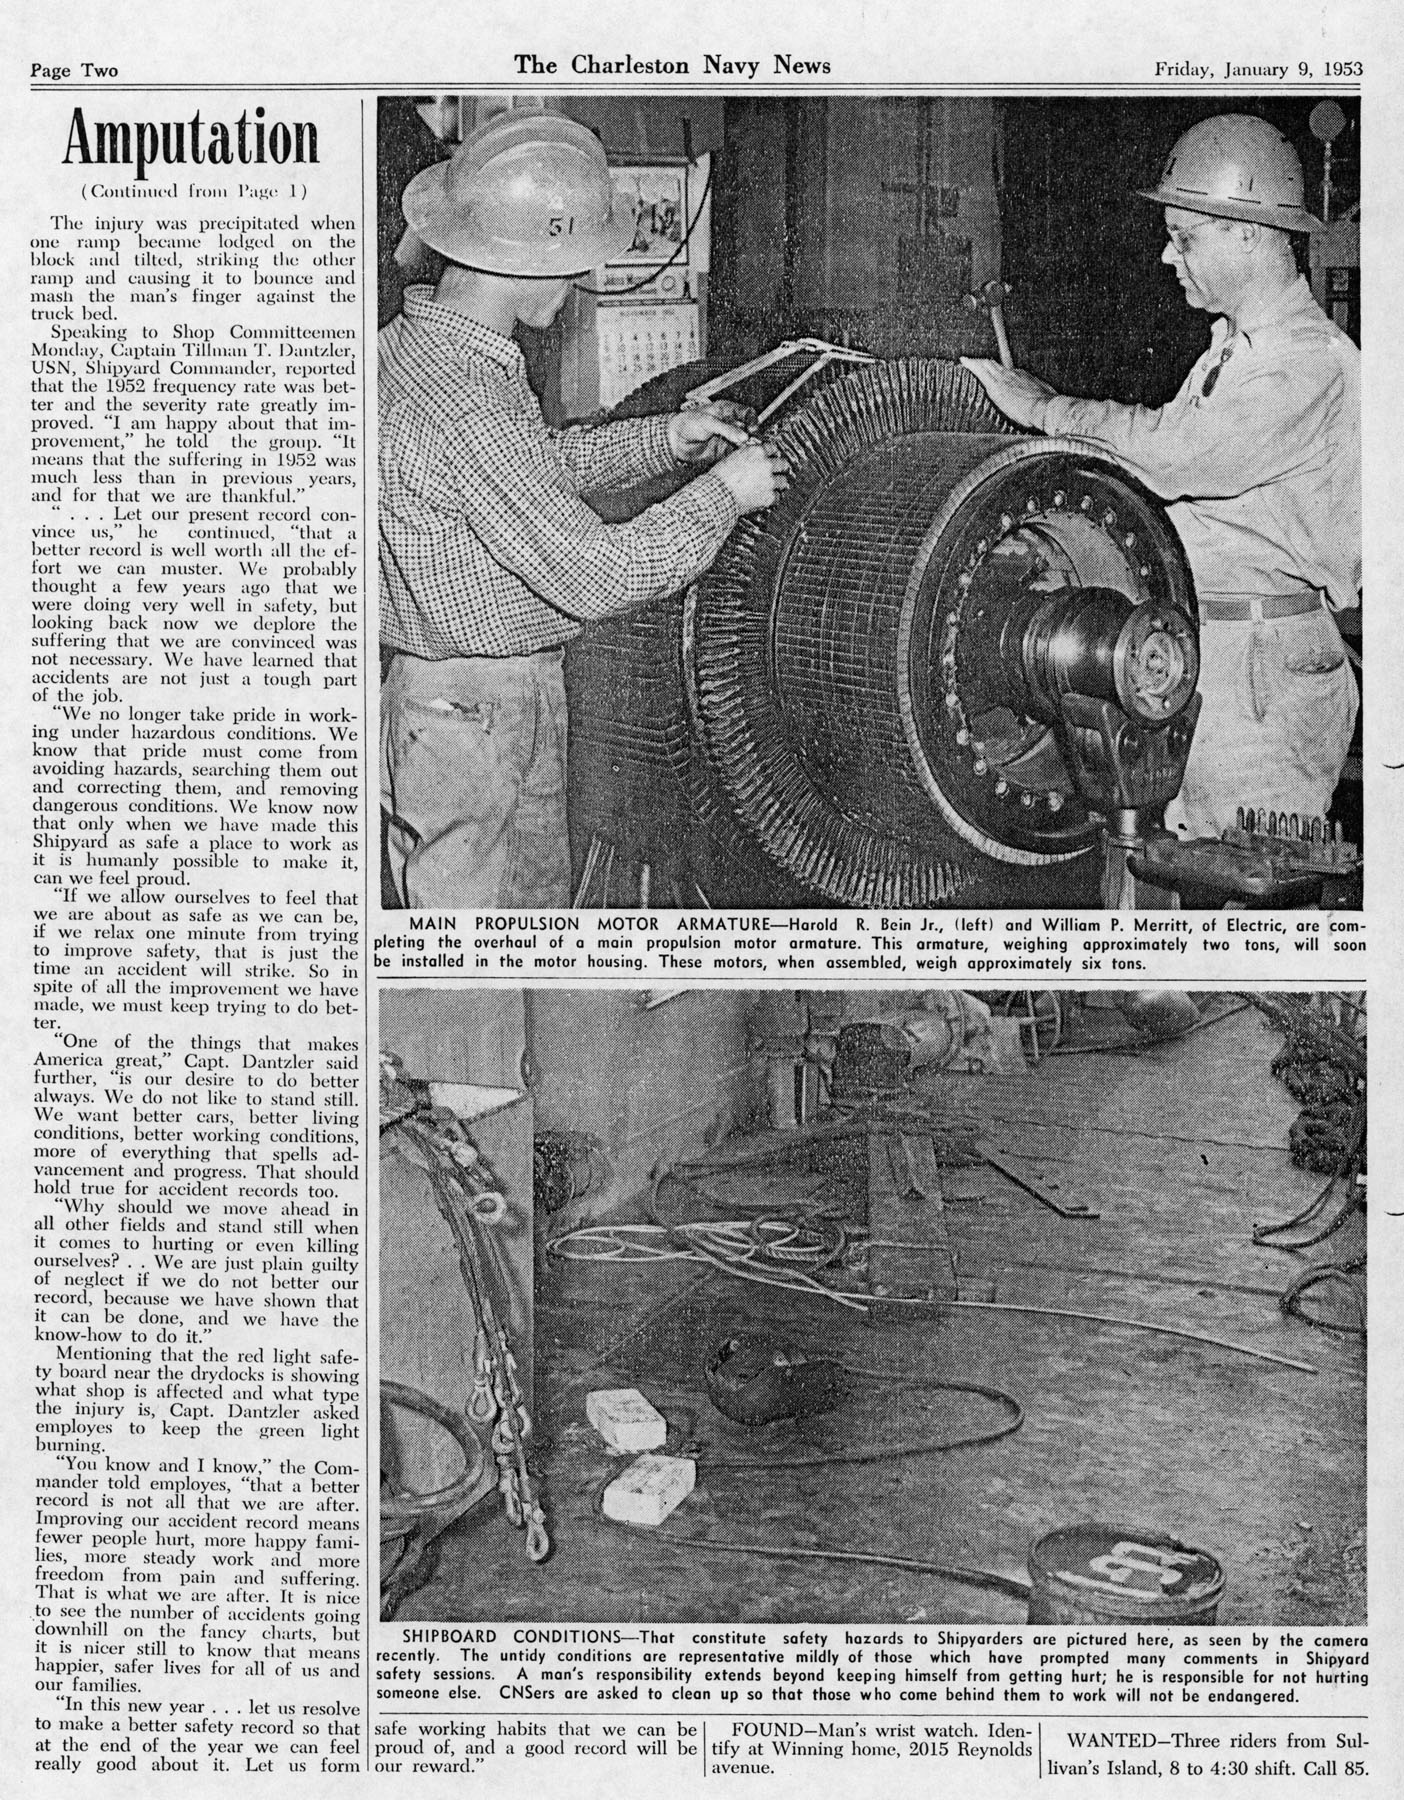 The Charleston Navy News, Volume 11, Edition 12, page ii